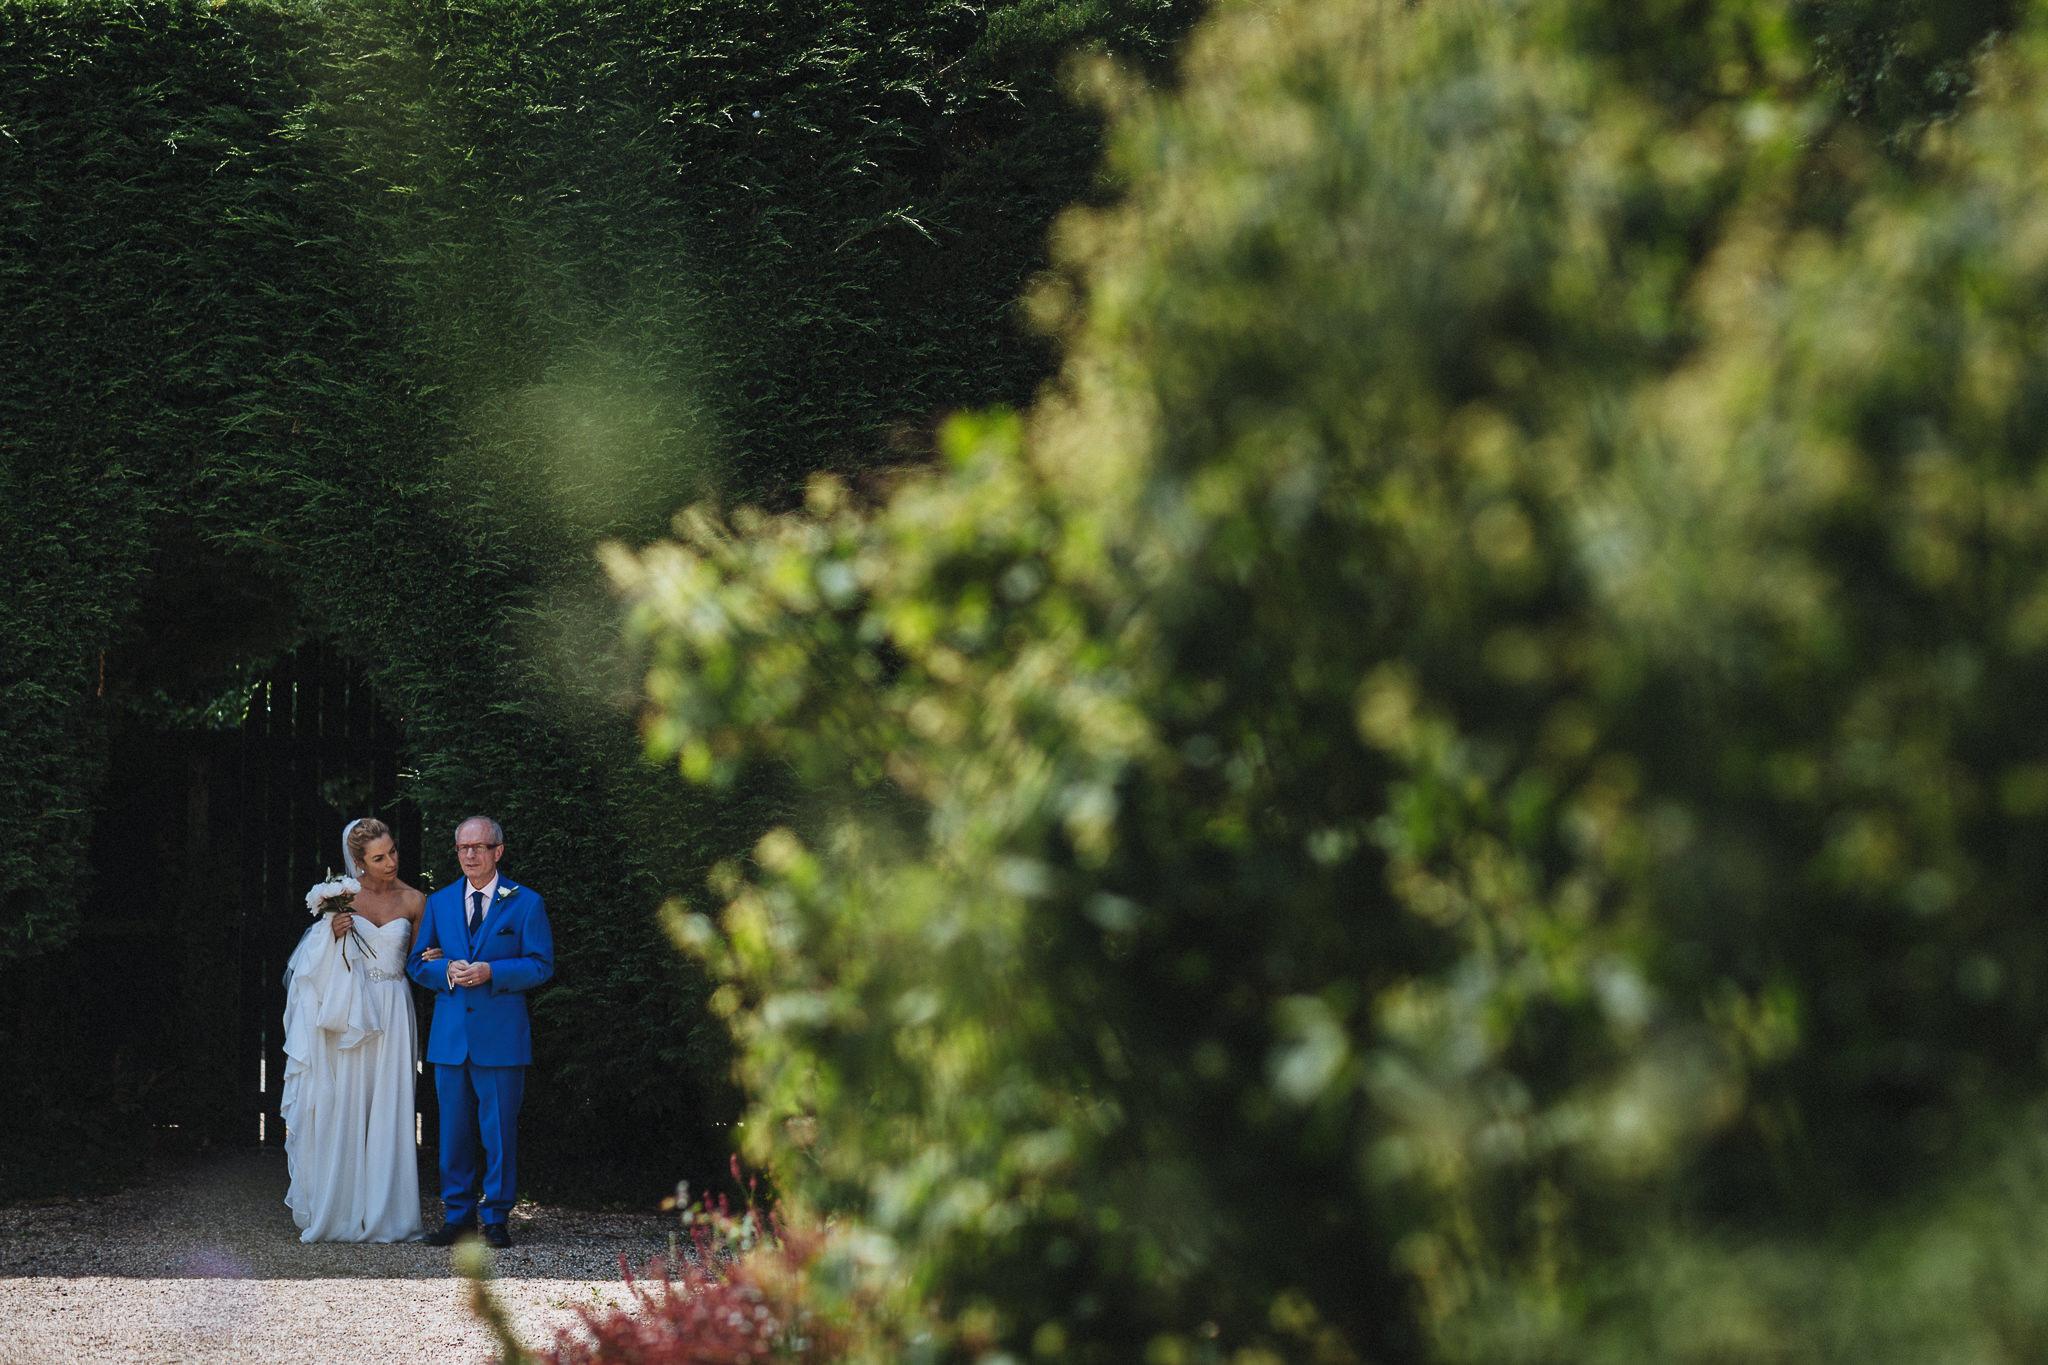 paul-marbrook-Gaynes-Park Wedding-Photographer-90038